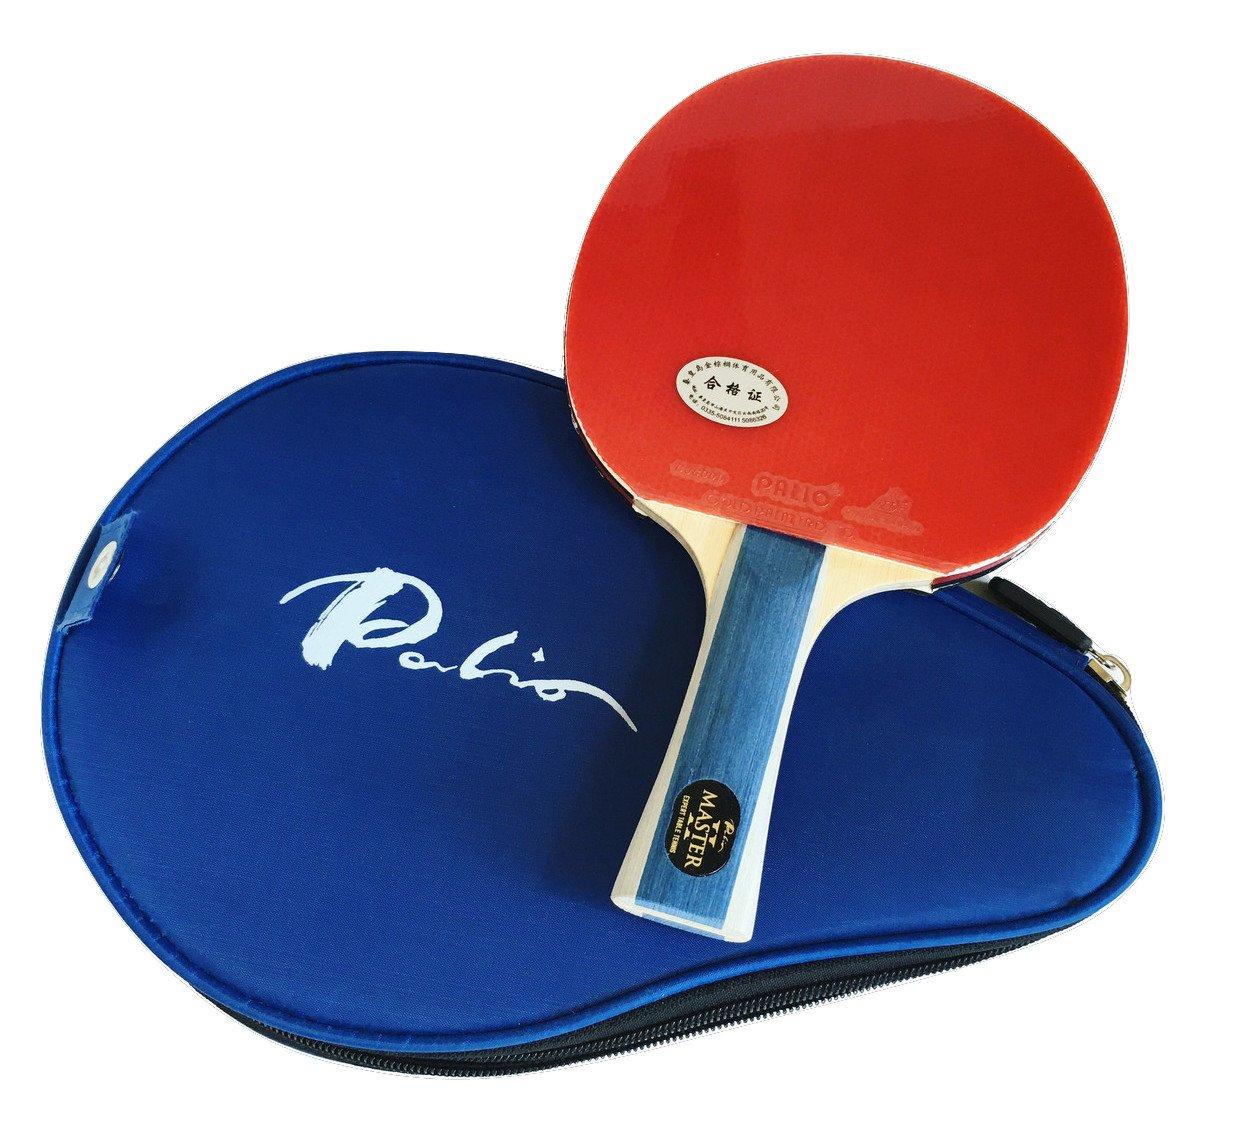 Palio Master 2 Table Tennis Racket & Case